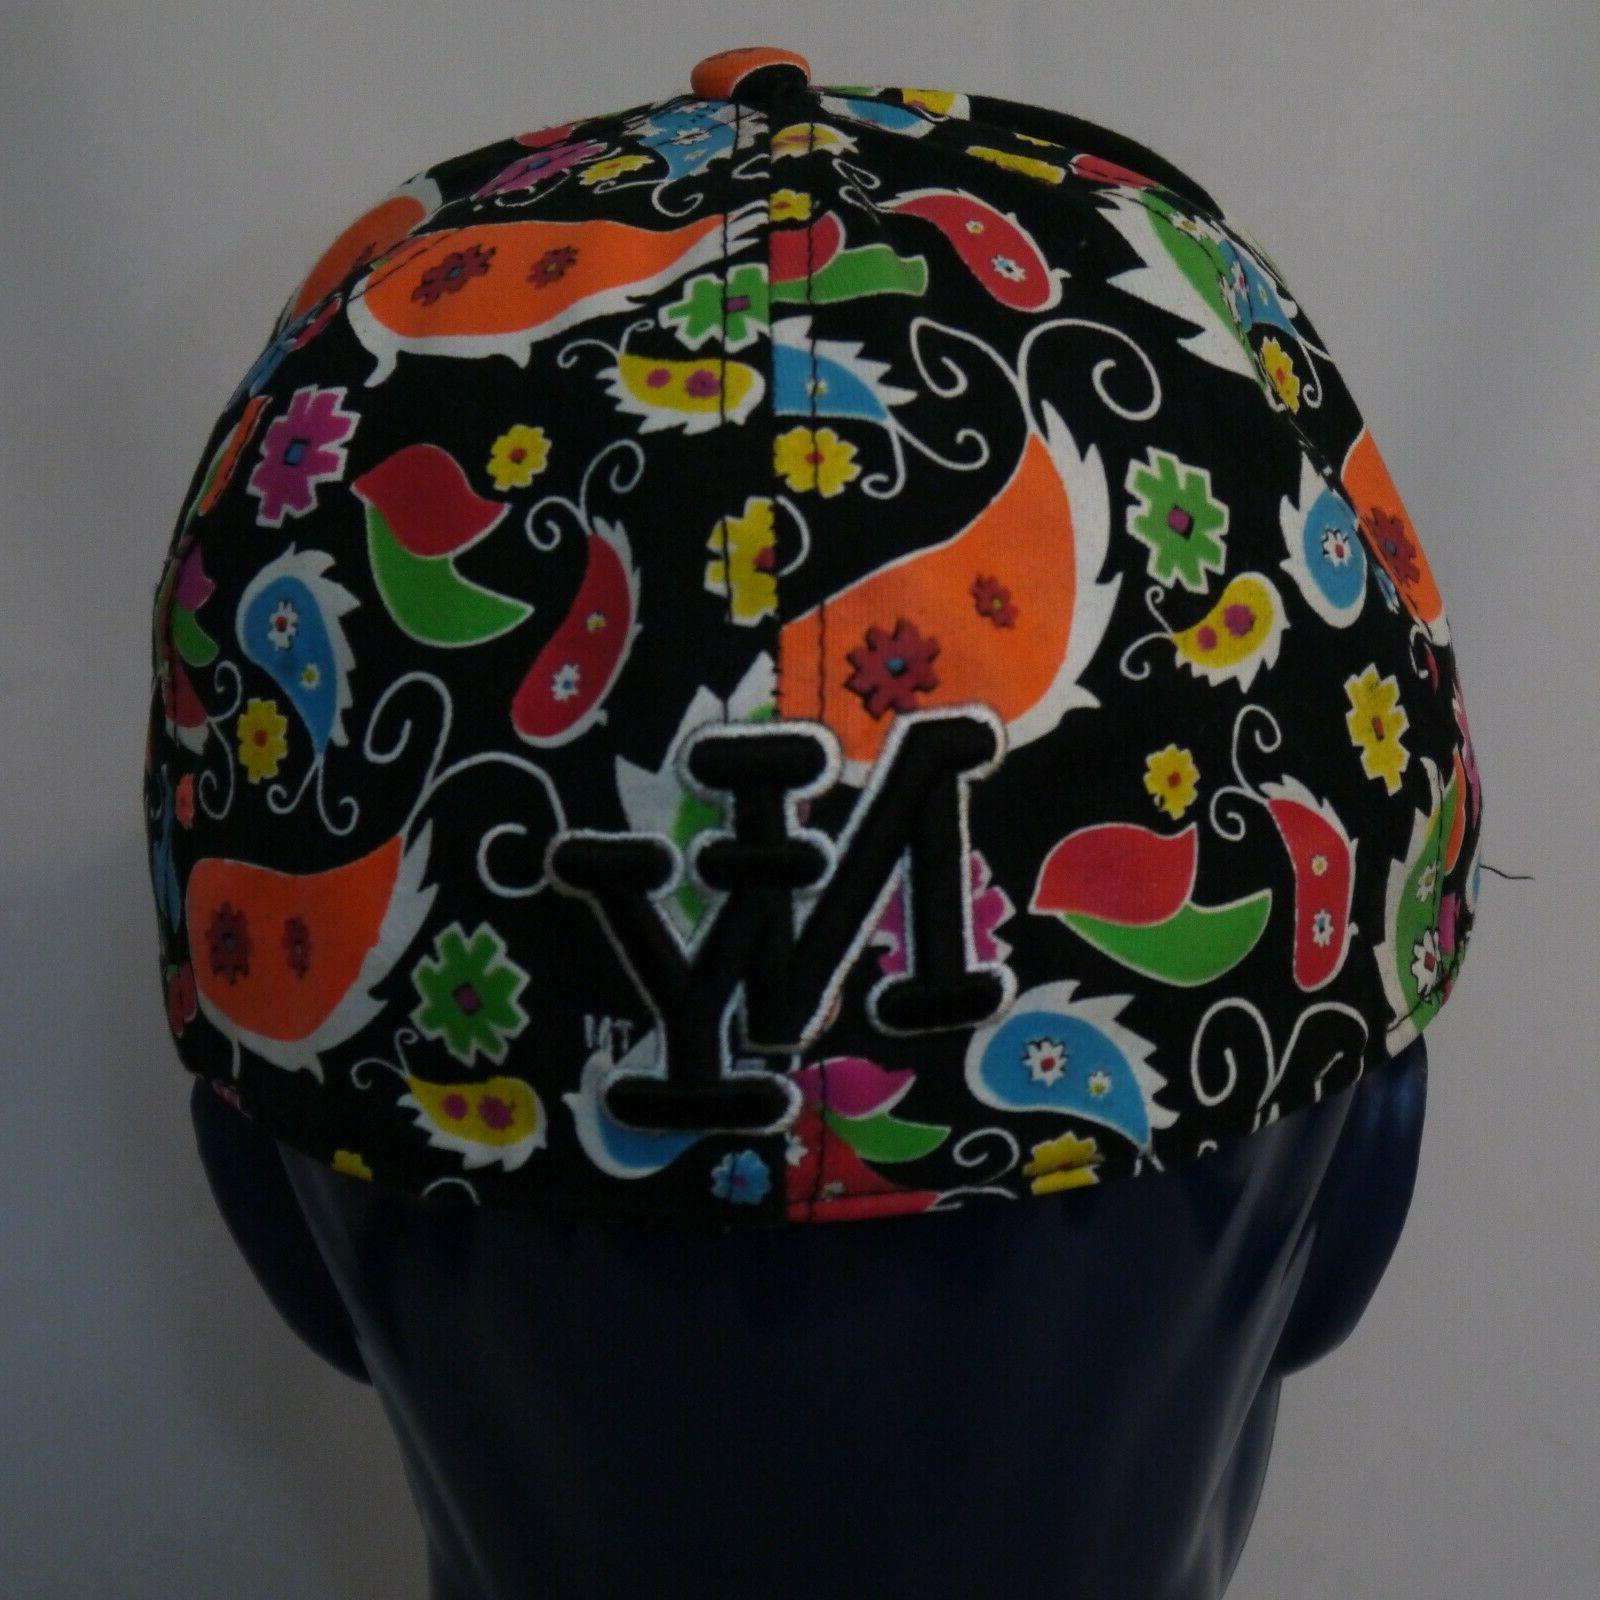 New Cap Baseball Cap Multicolor Hat